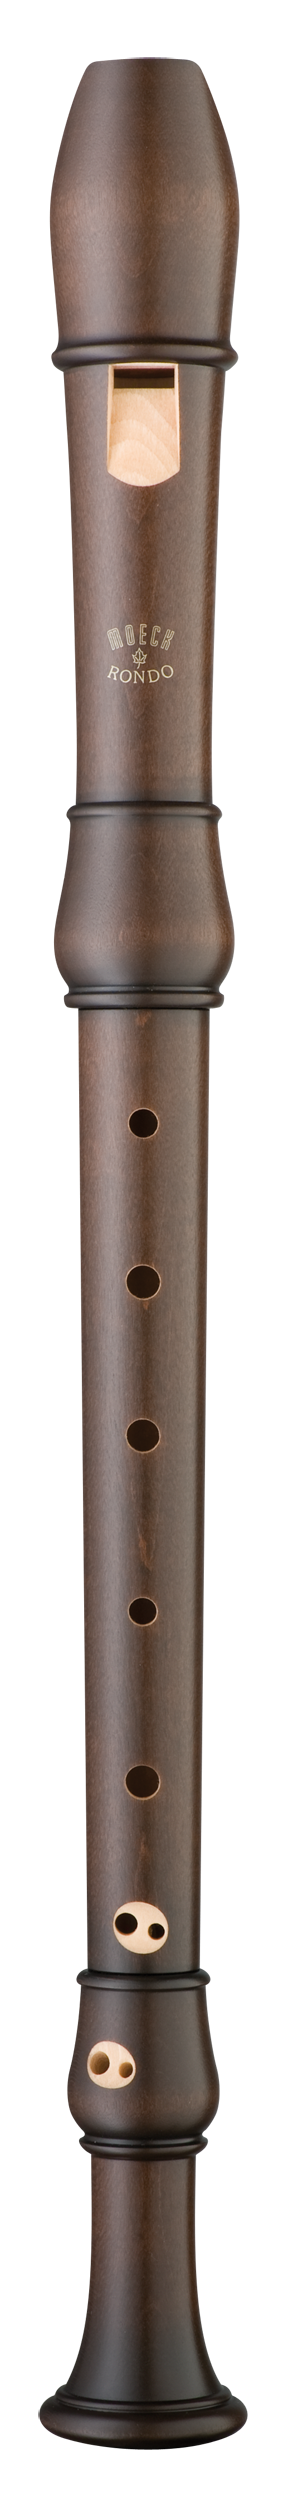 Altblockflöte Barocke Griffweise 2301 Flauto Rondo Moeck